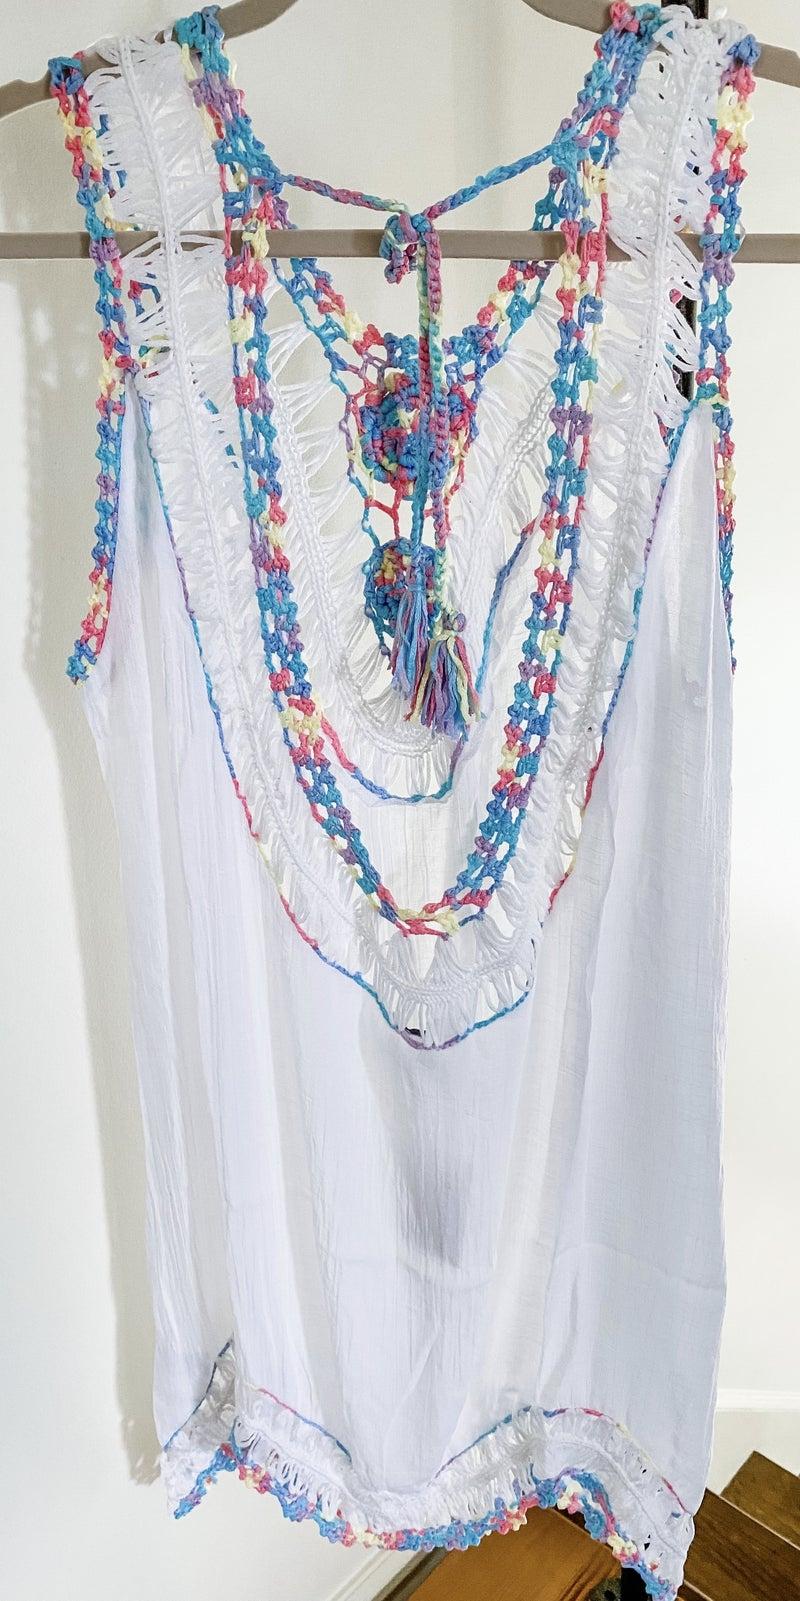 Rainbow Crochet Cover-up